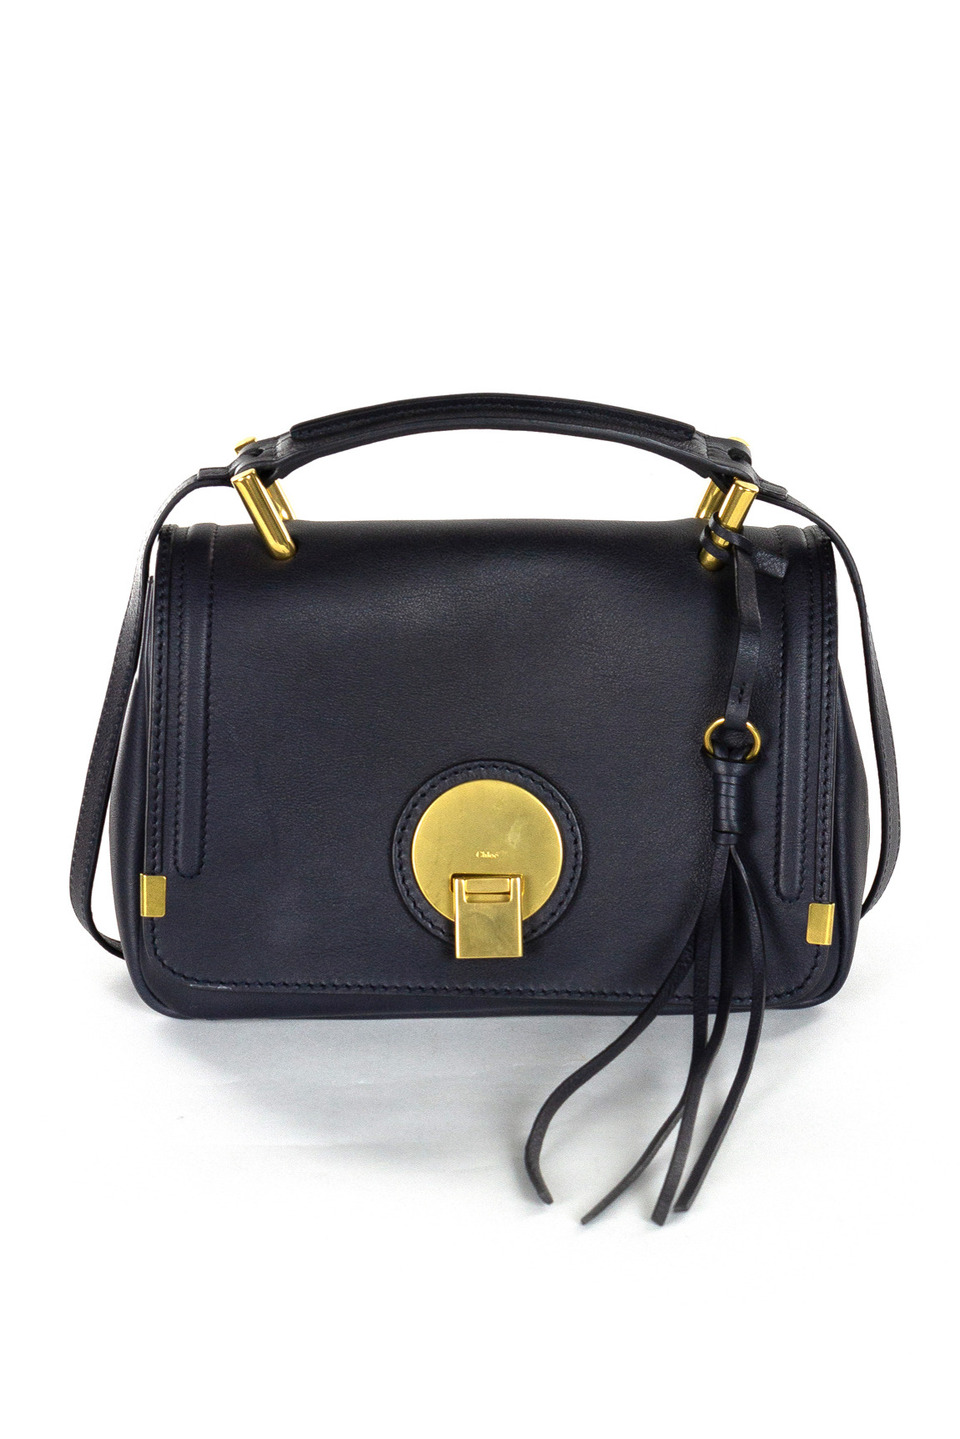 Chloe Leather Handbag in Navy